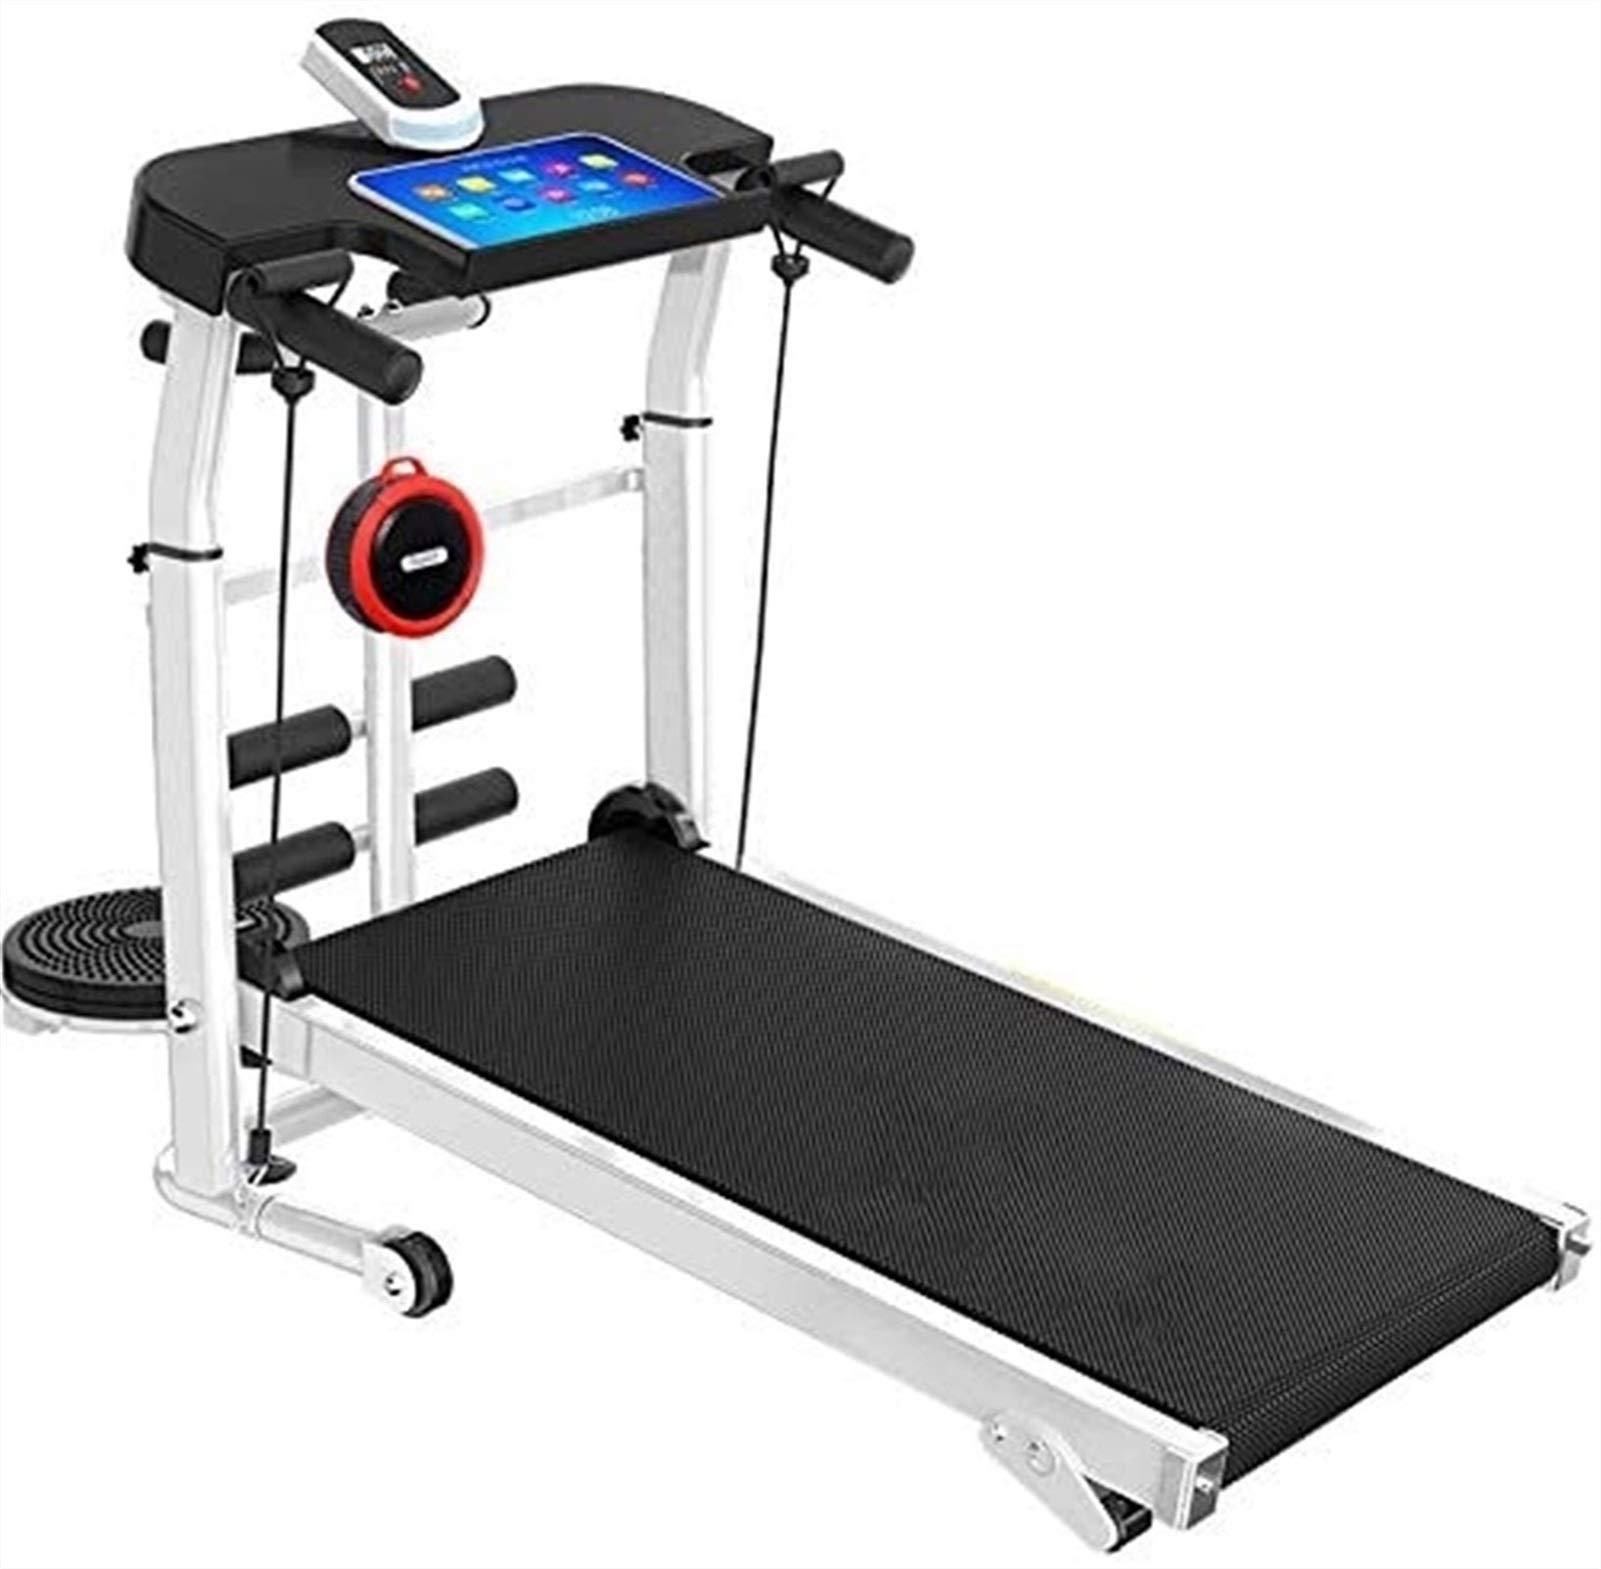 2 in 1 Manual Walking Treadmills, Portable Sit ups & Running for Home Office Use Gym Treadmills Unisex Household Mechanical Treadmill Machine RunningMachine1121